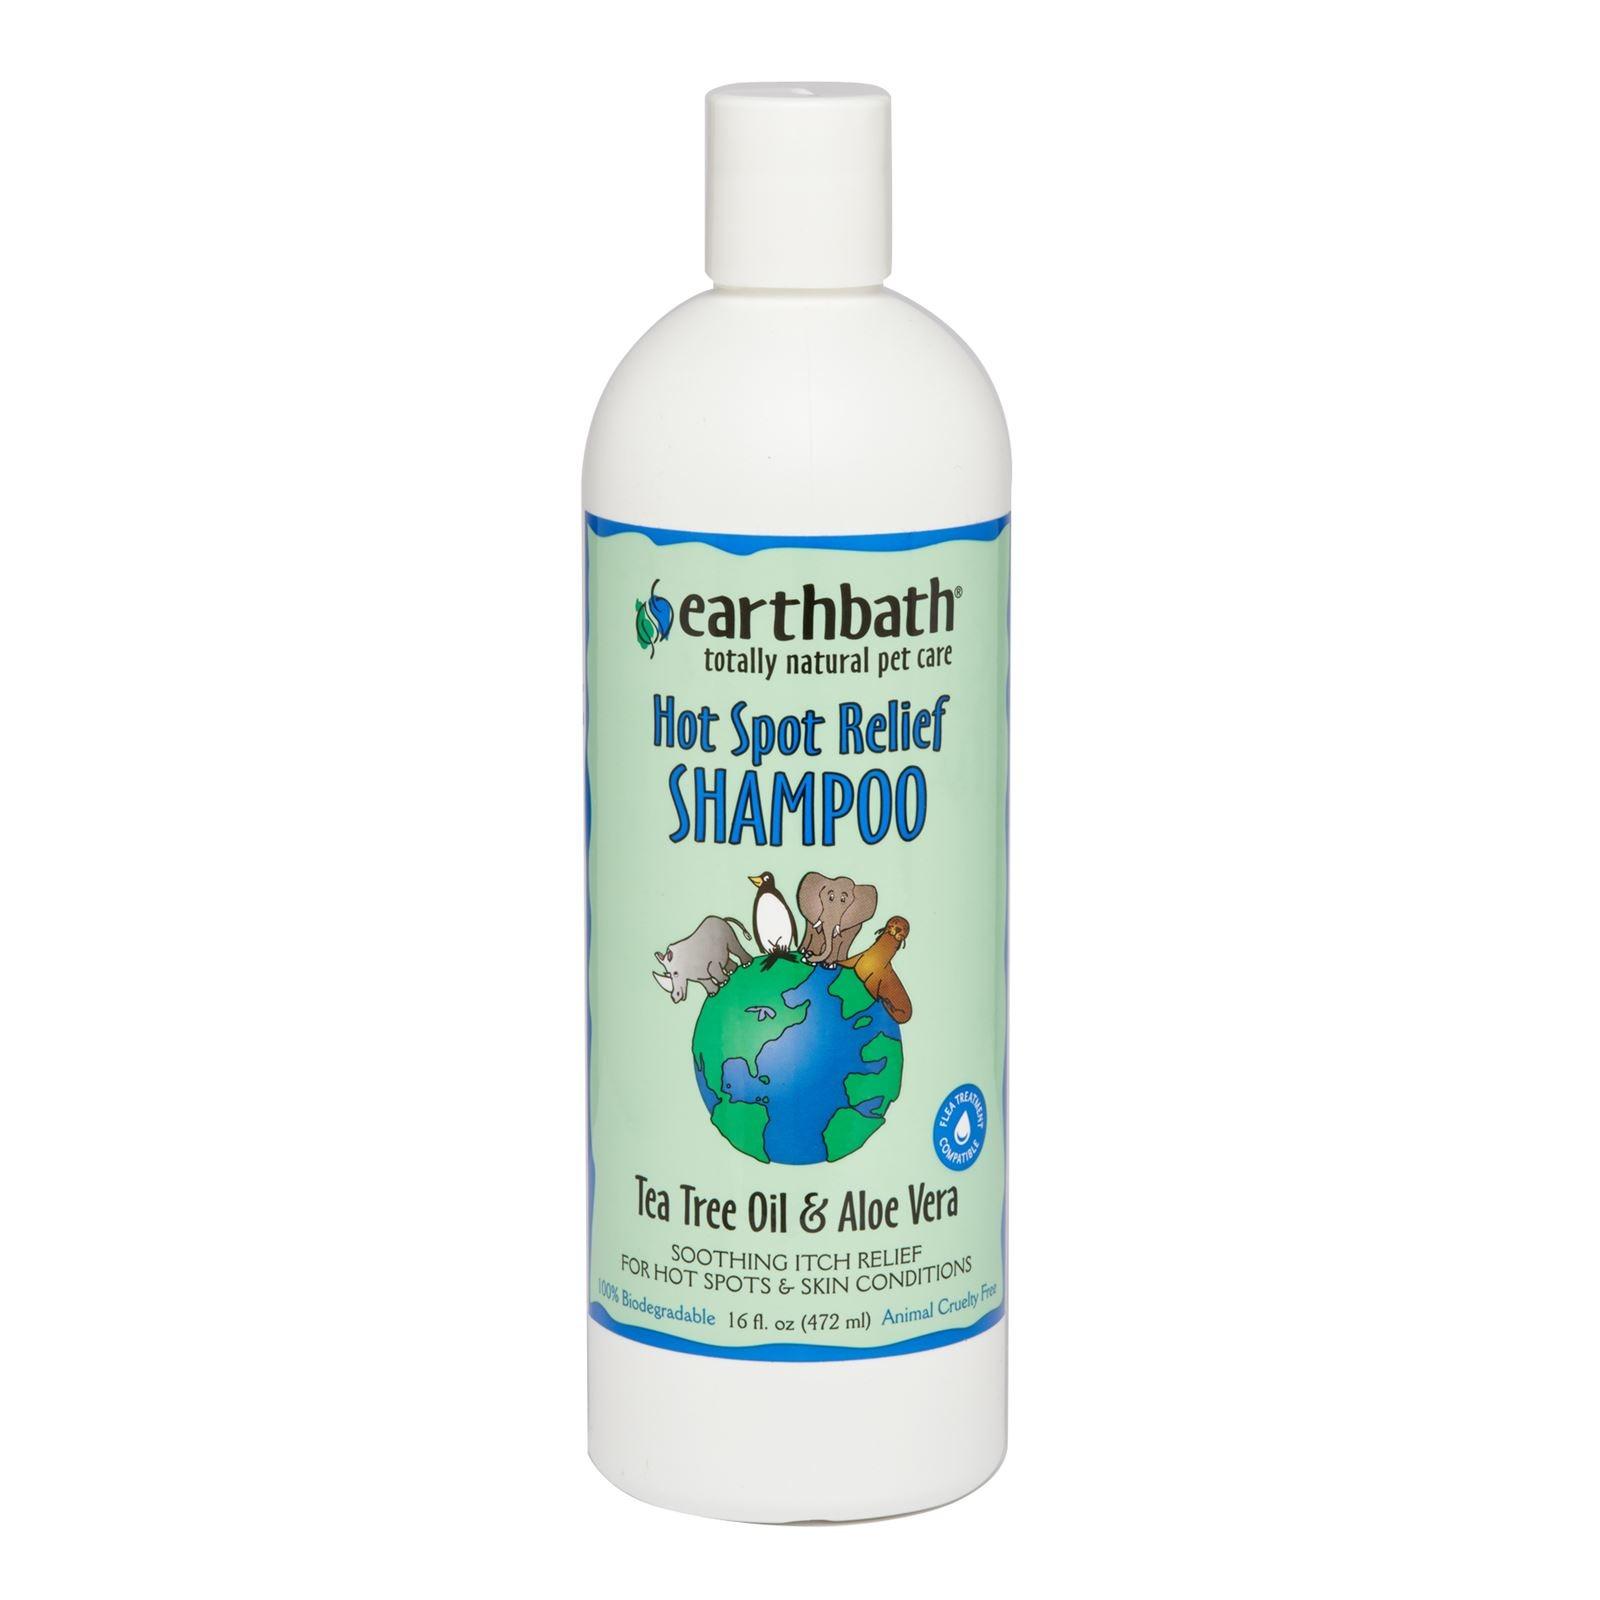 Earthbath Tea Tree & Aloe Vera Shampoo